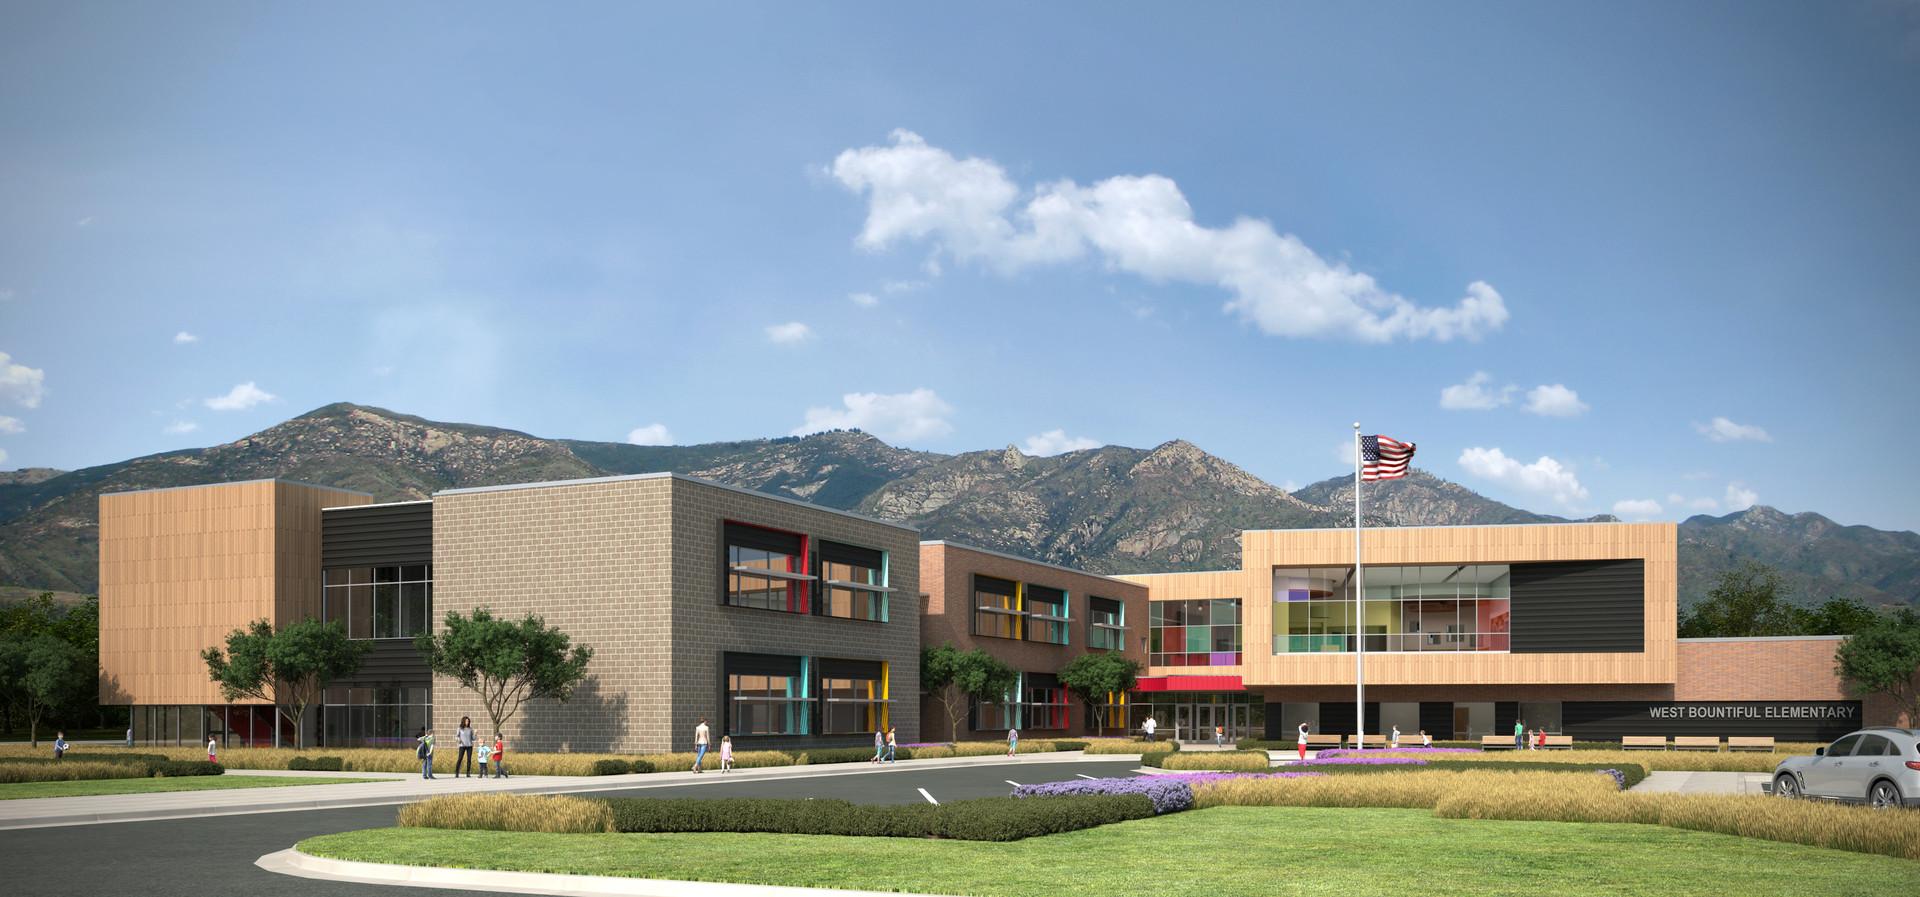 West Bountiful Elementary School Rebuild